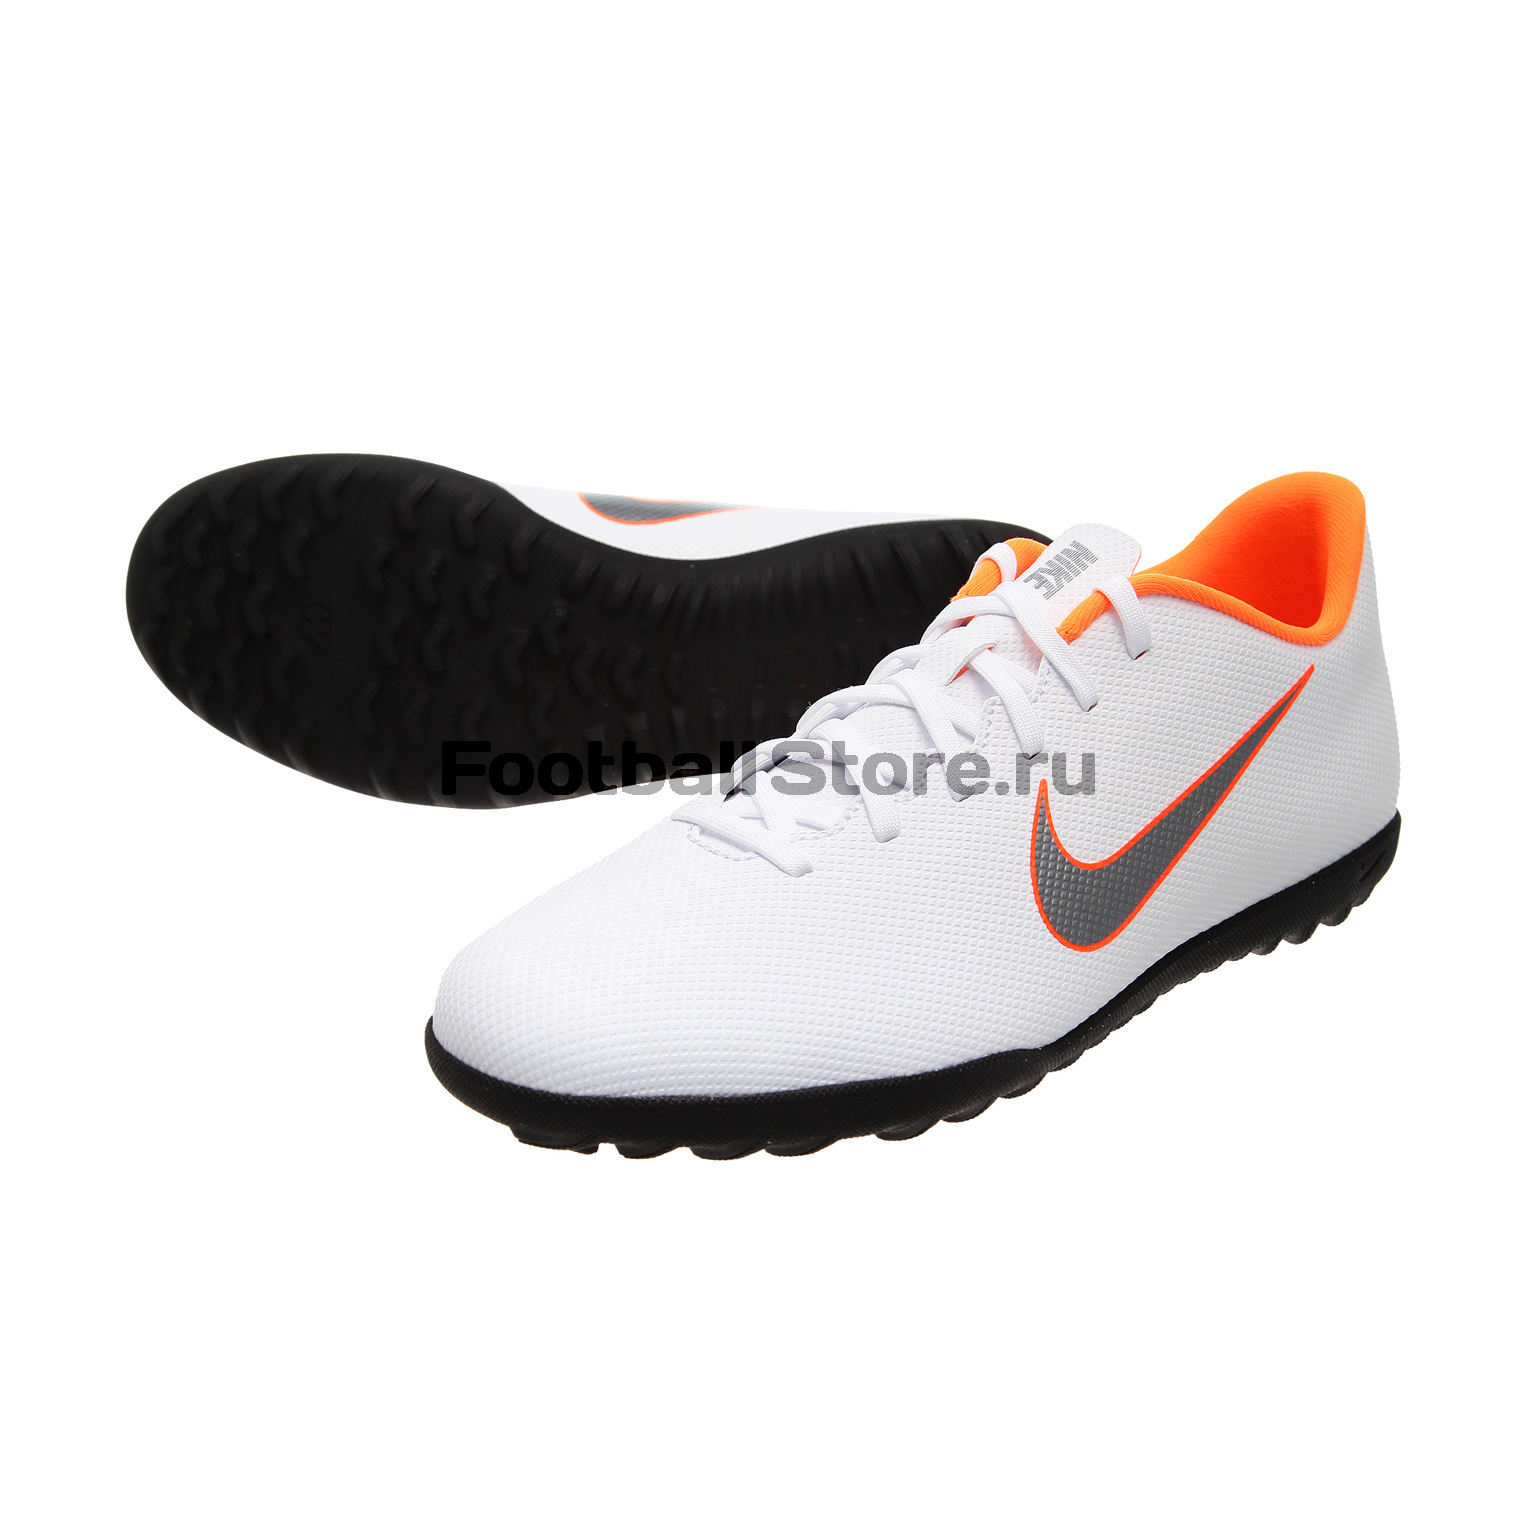 Шиповки Nike VaporX 12 Club TF AH7386-107 шиповки nike lunar legendx 7 pro tf ah7249 080